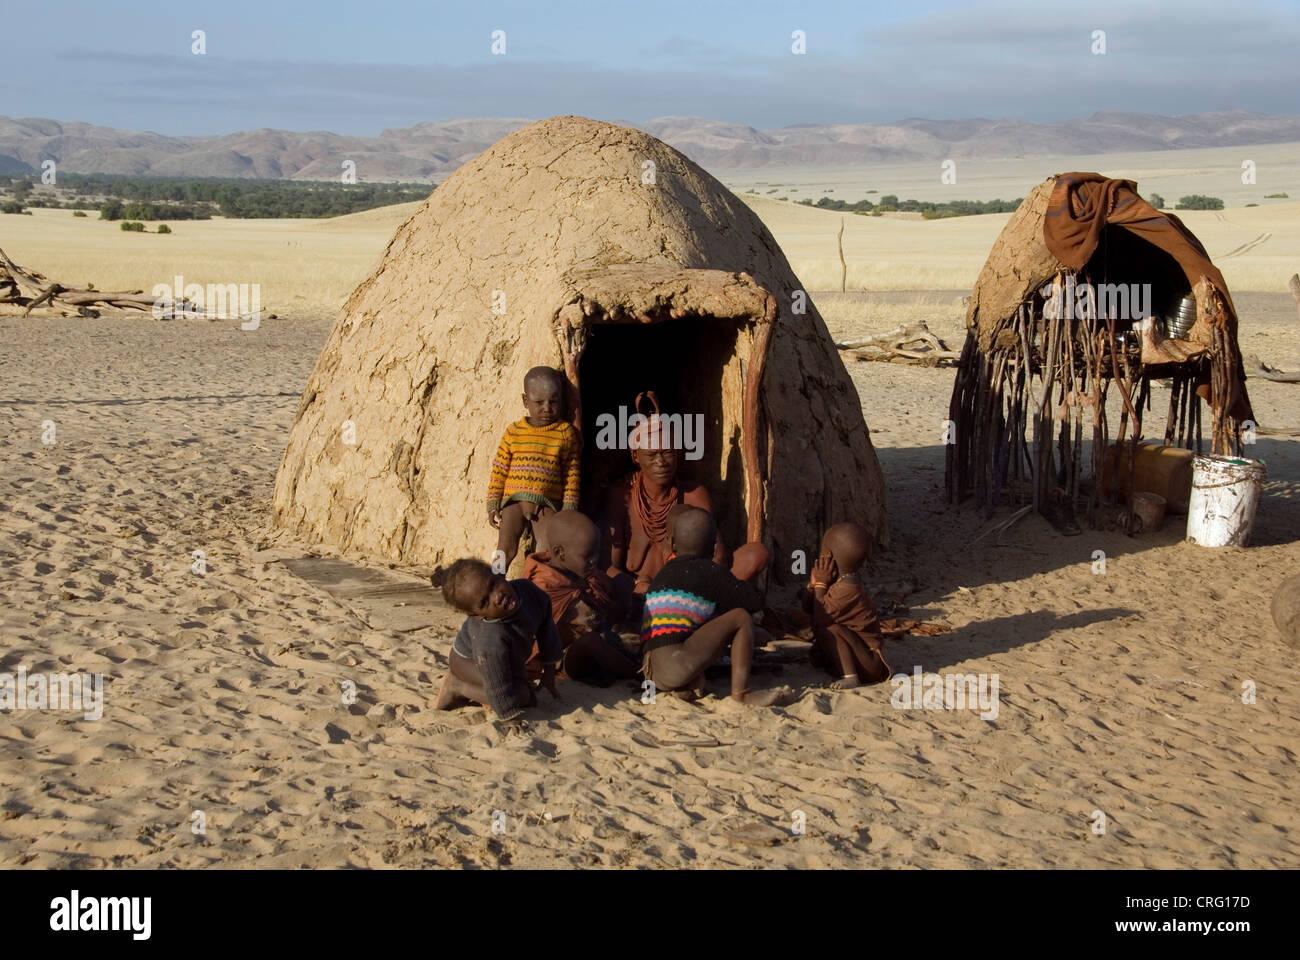 Himba women and children in Kaokoveld, the tribal village